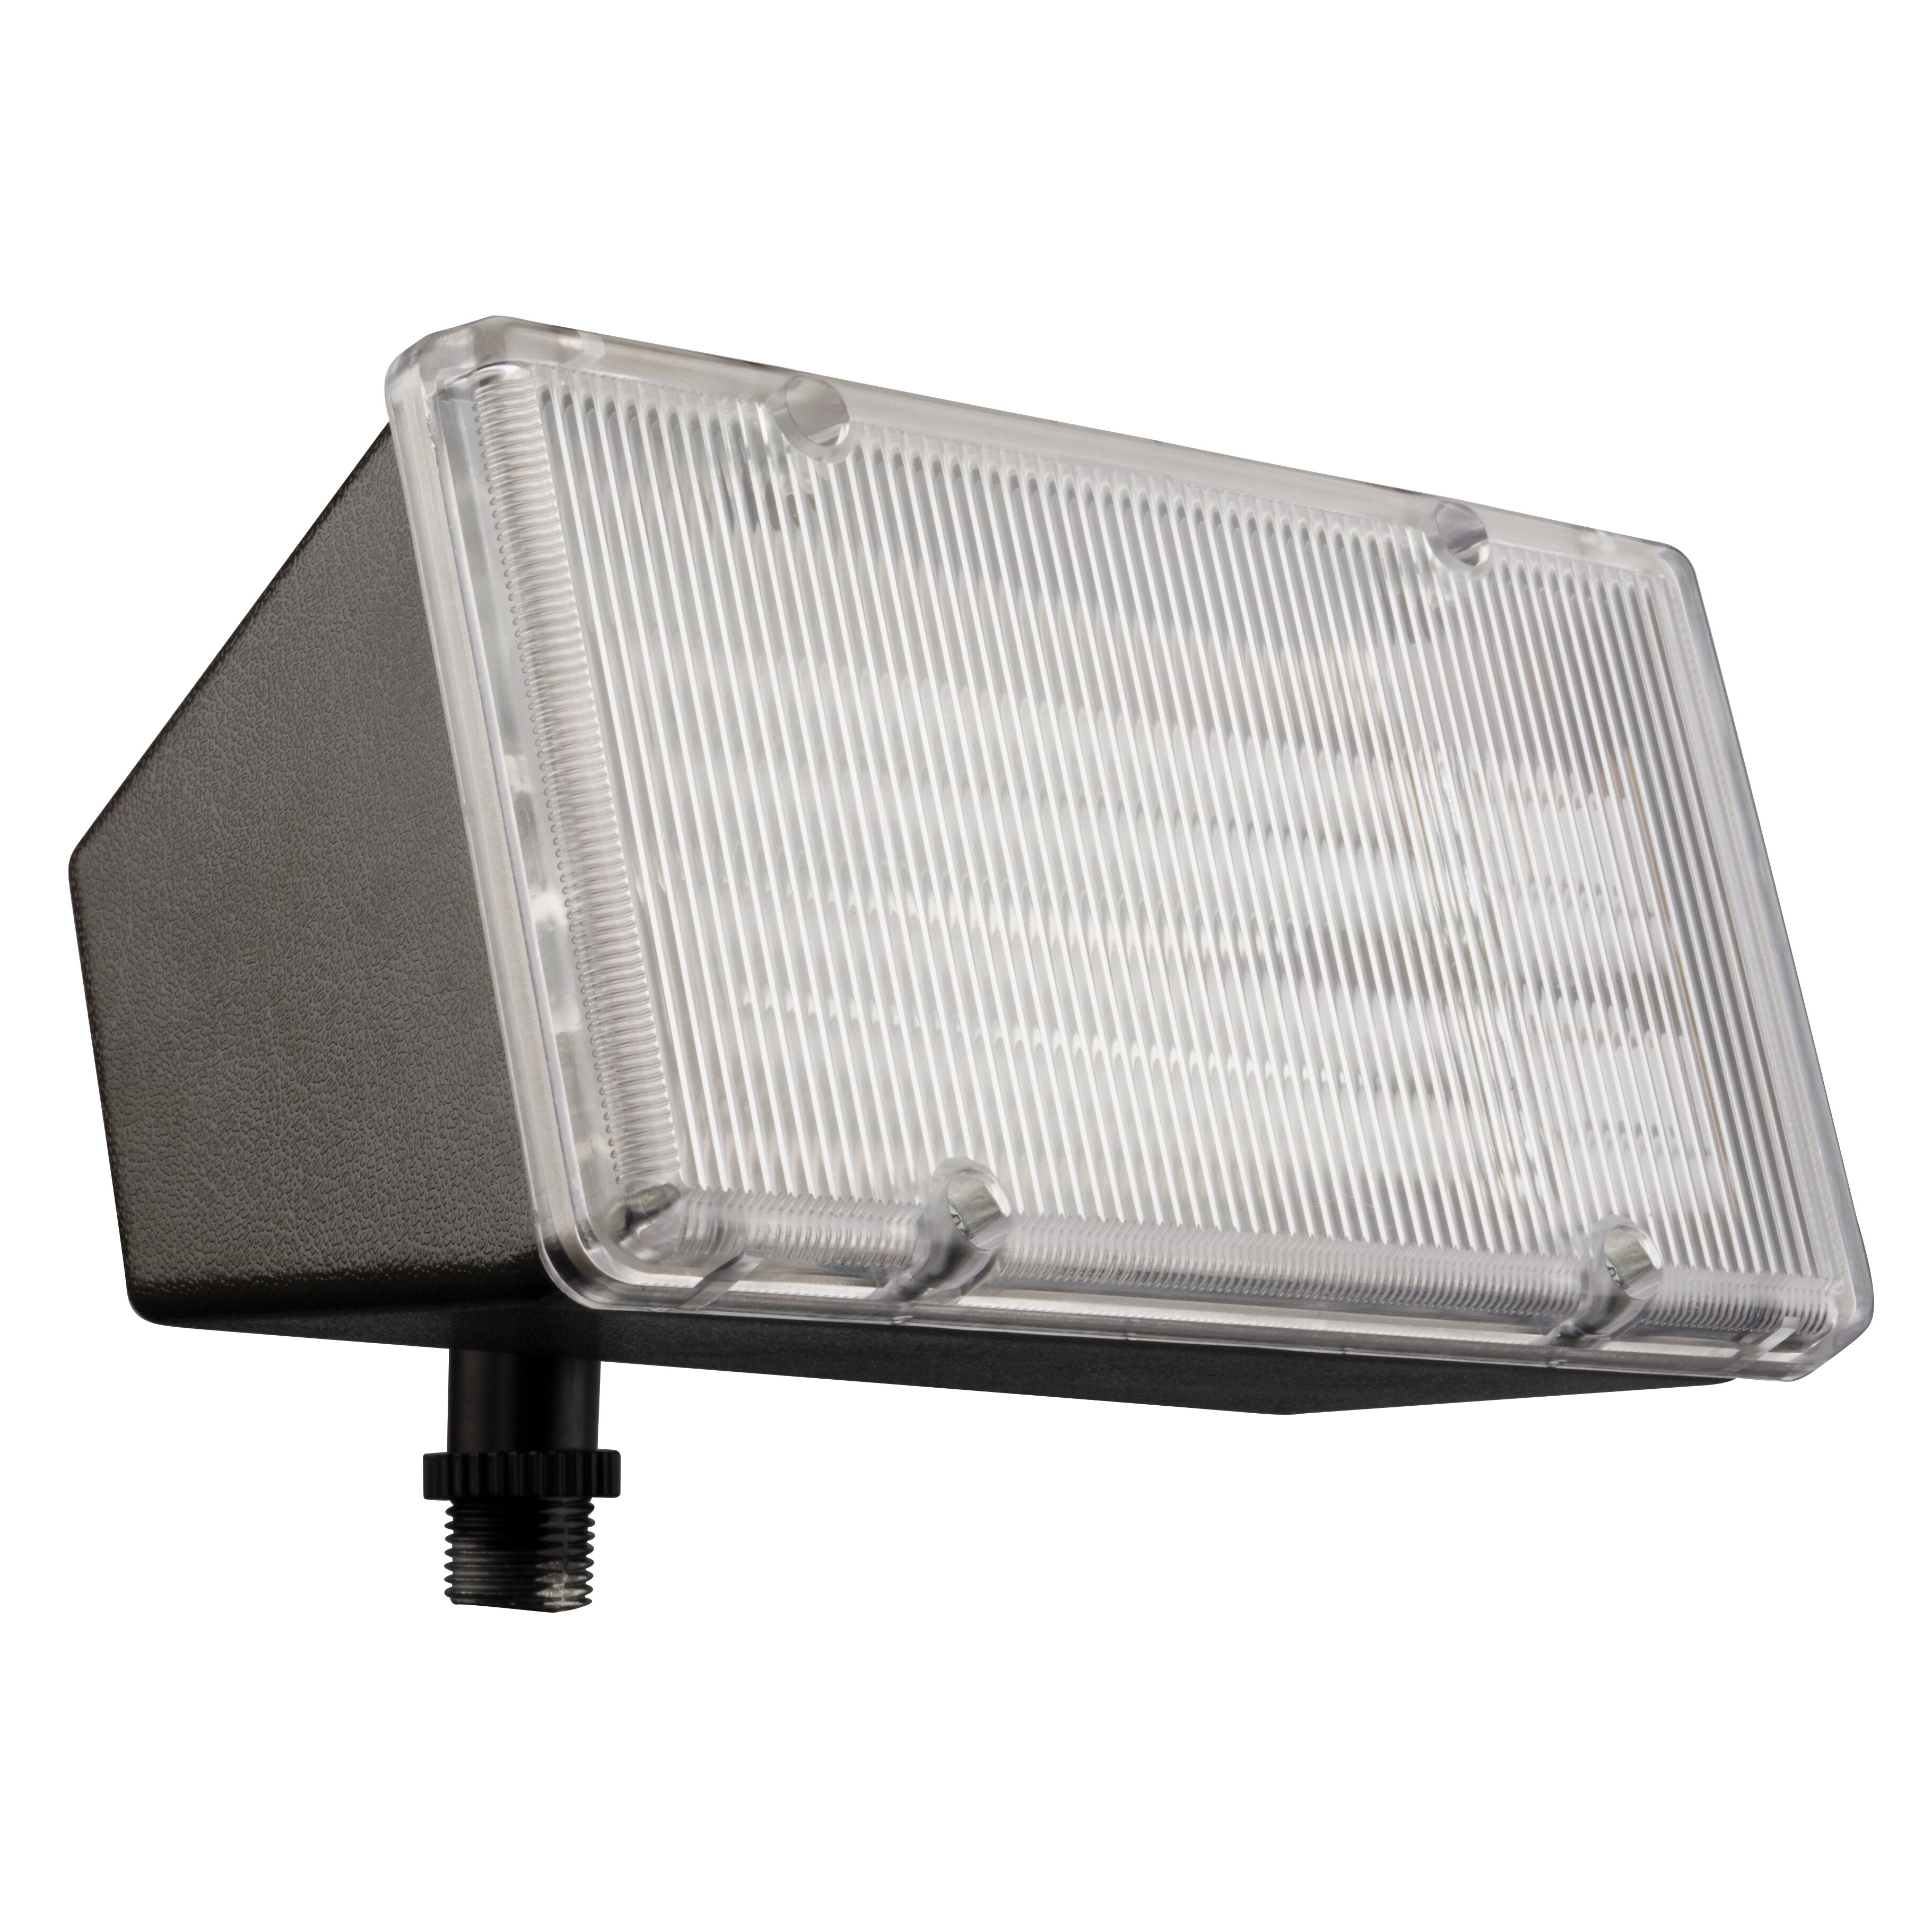 security flood light by lithonia lighting. Black Bedroom Furniture Sets. Home Design Ideas